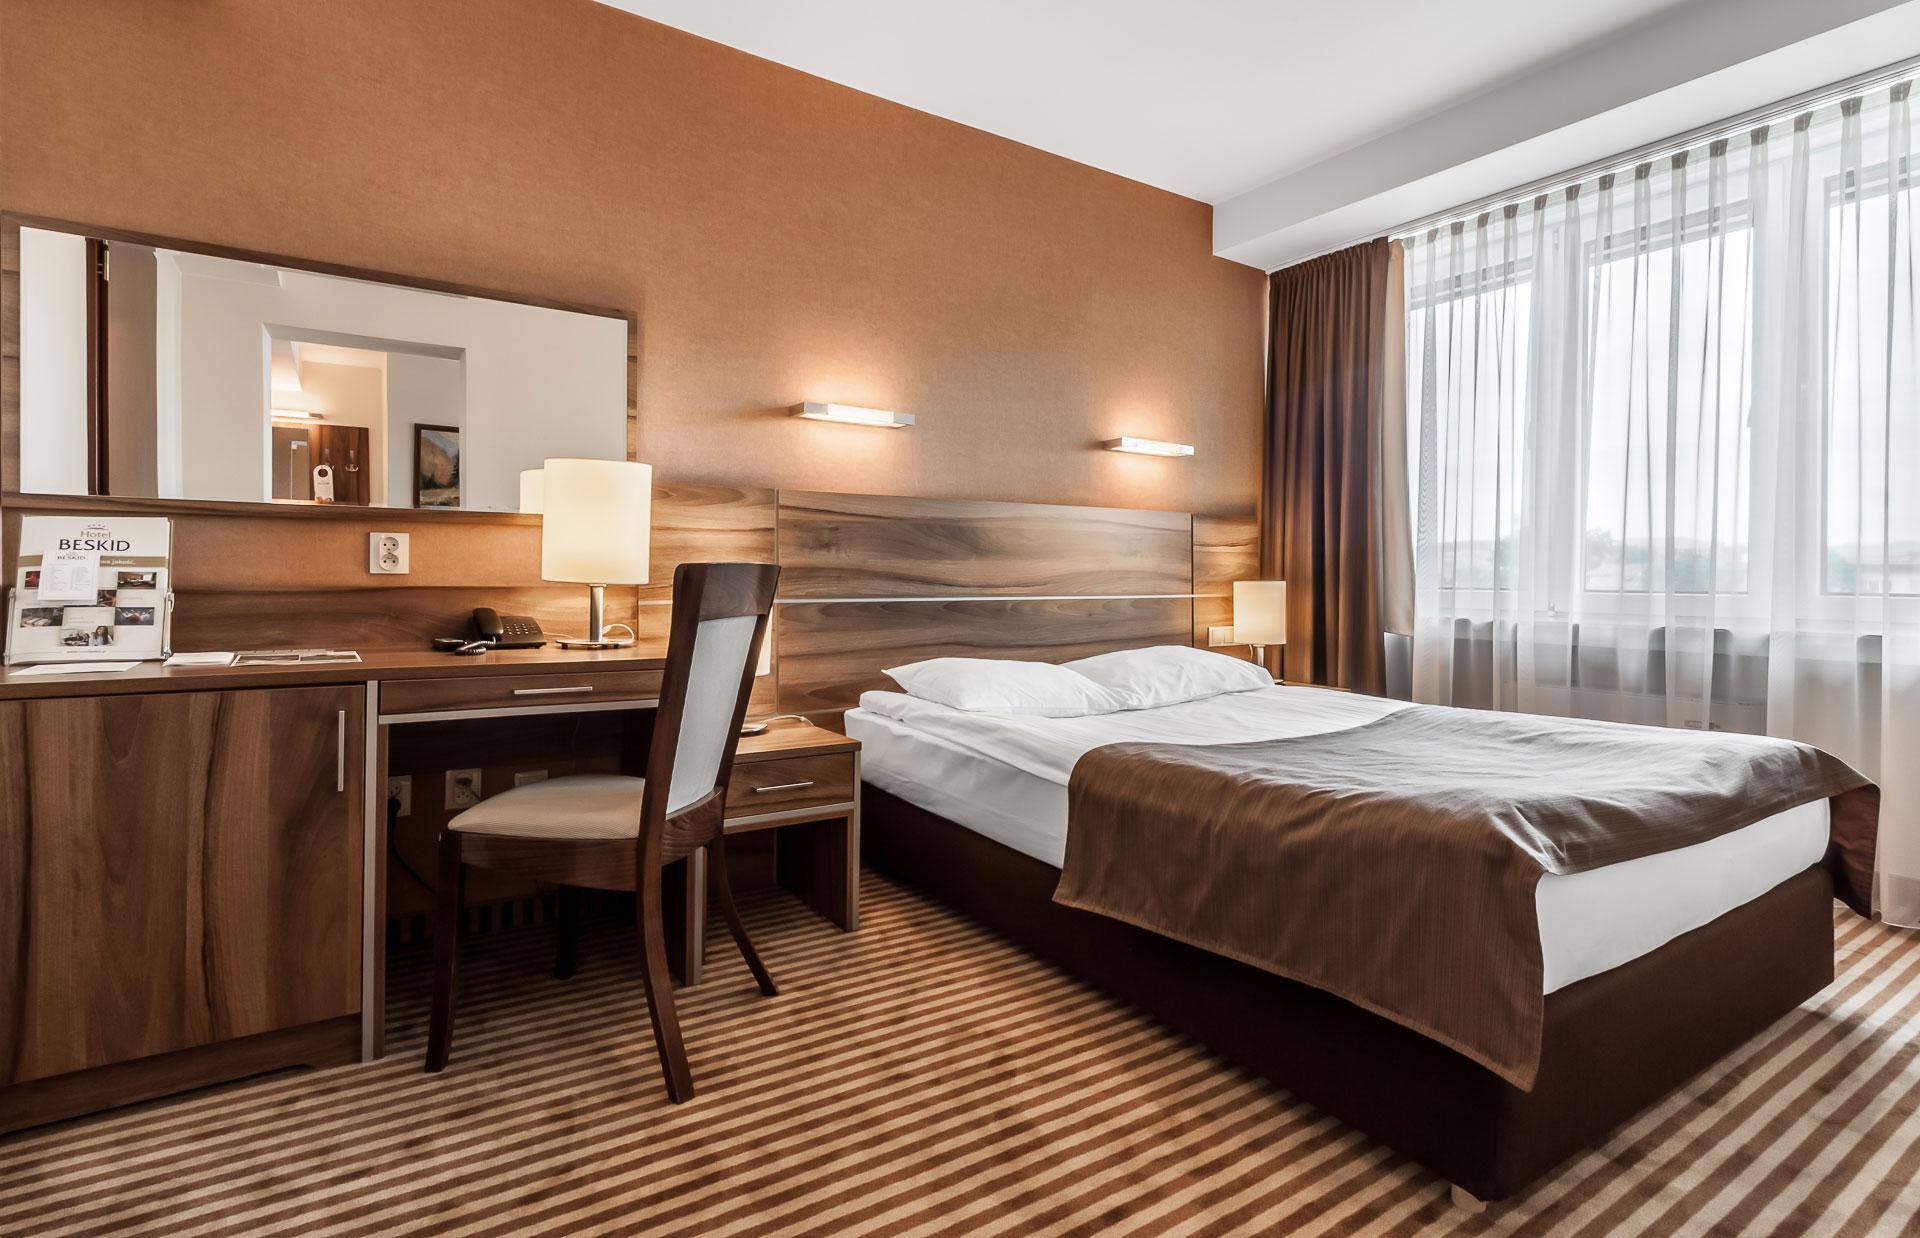 Zdjęcie - Double room - Hotel Beskid****